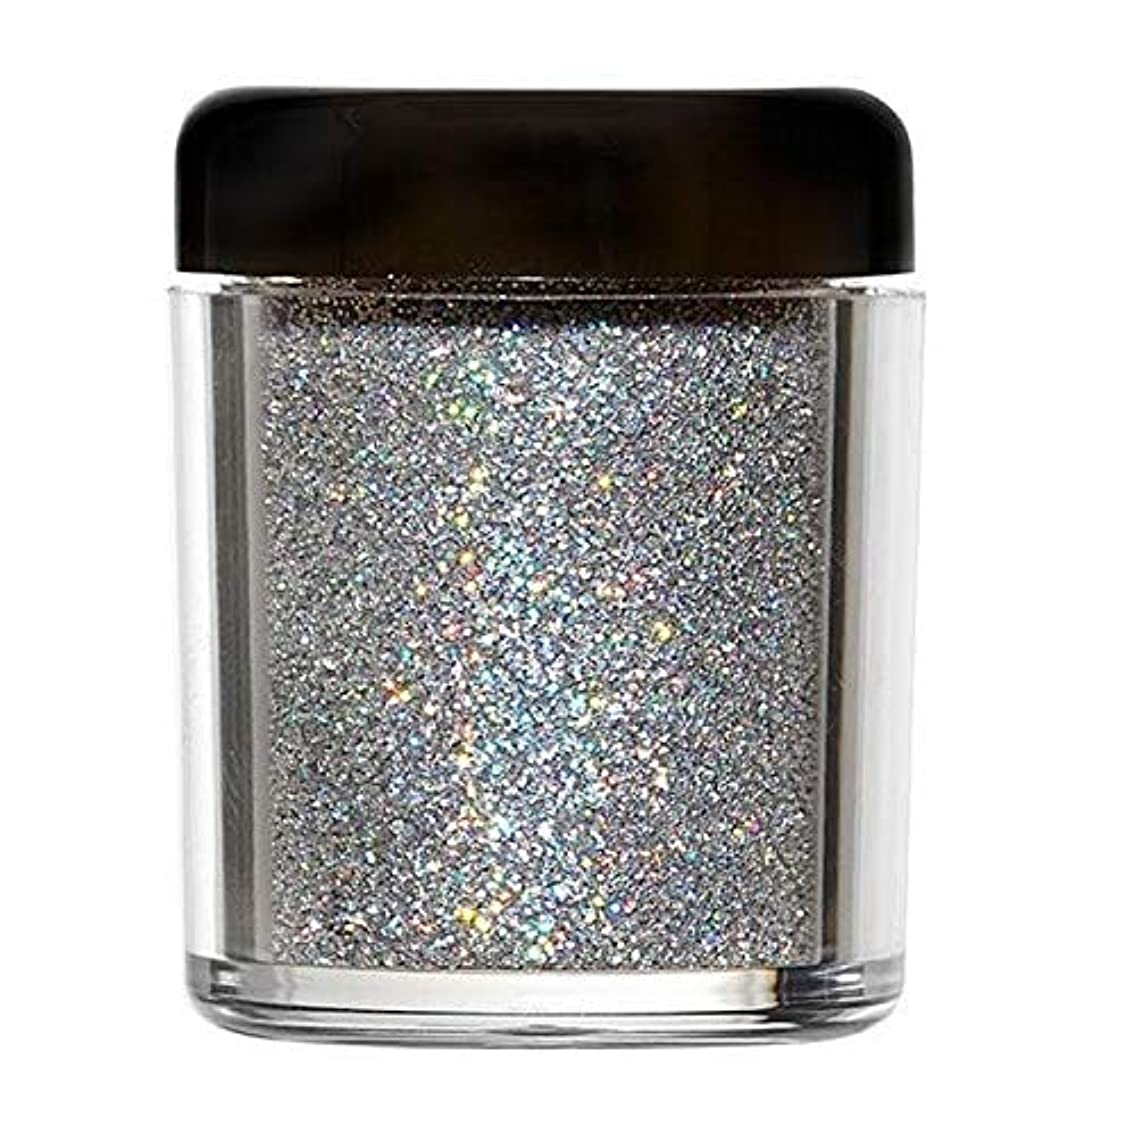 [Barry M ] バリーメートルのグリッターラッシュボディの輝き - ムーンストーン - Barry M Glitter Rush Body Glitter - Moonstone [並行輸入品]